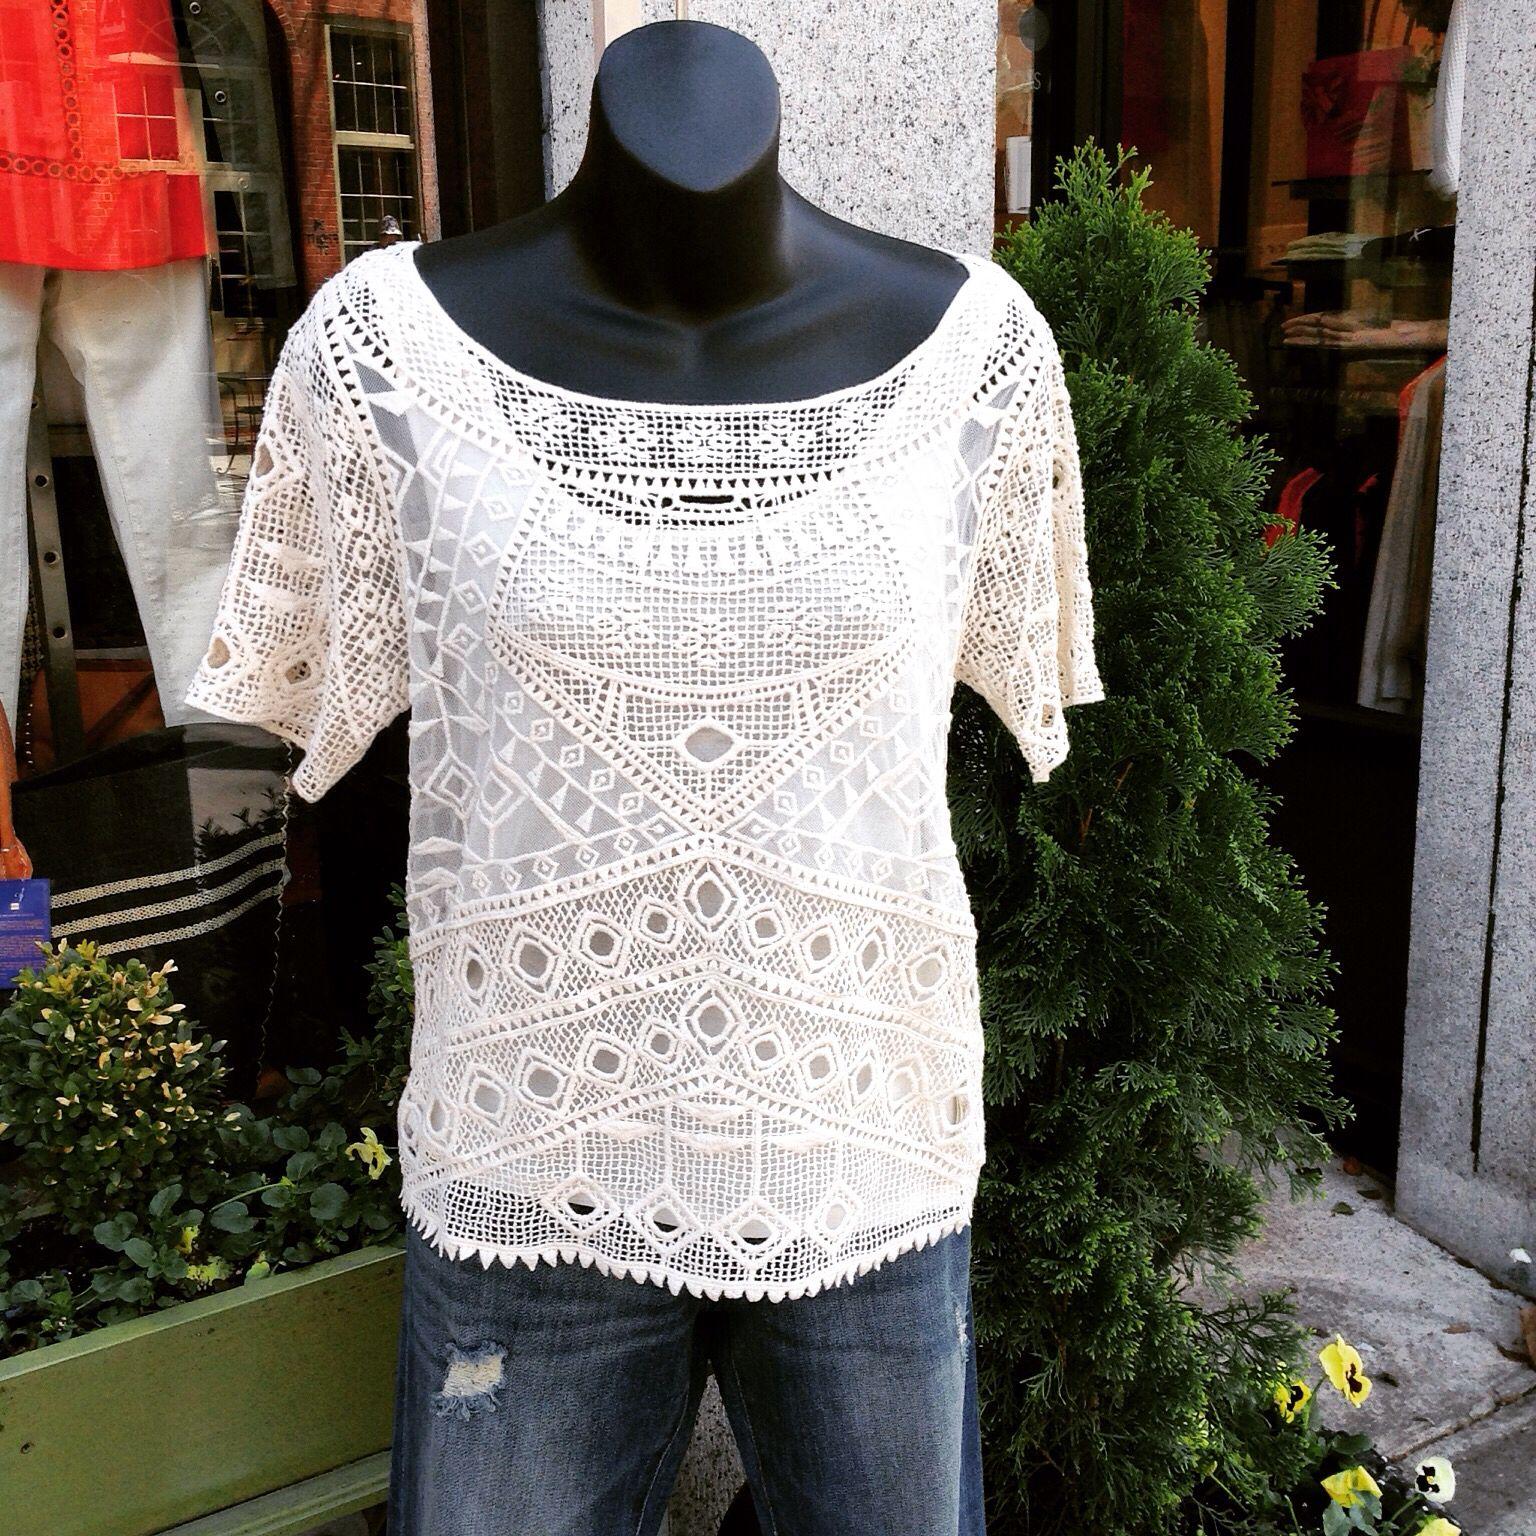 Crochet top with denim #jmodefashions